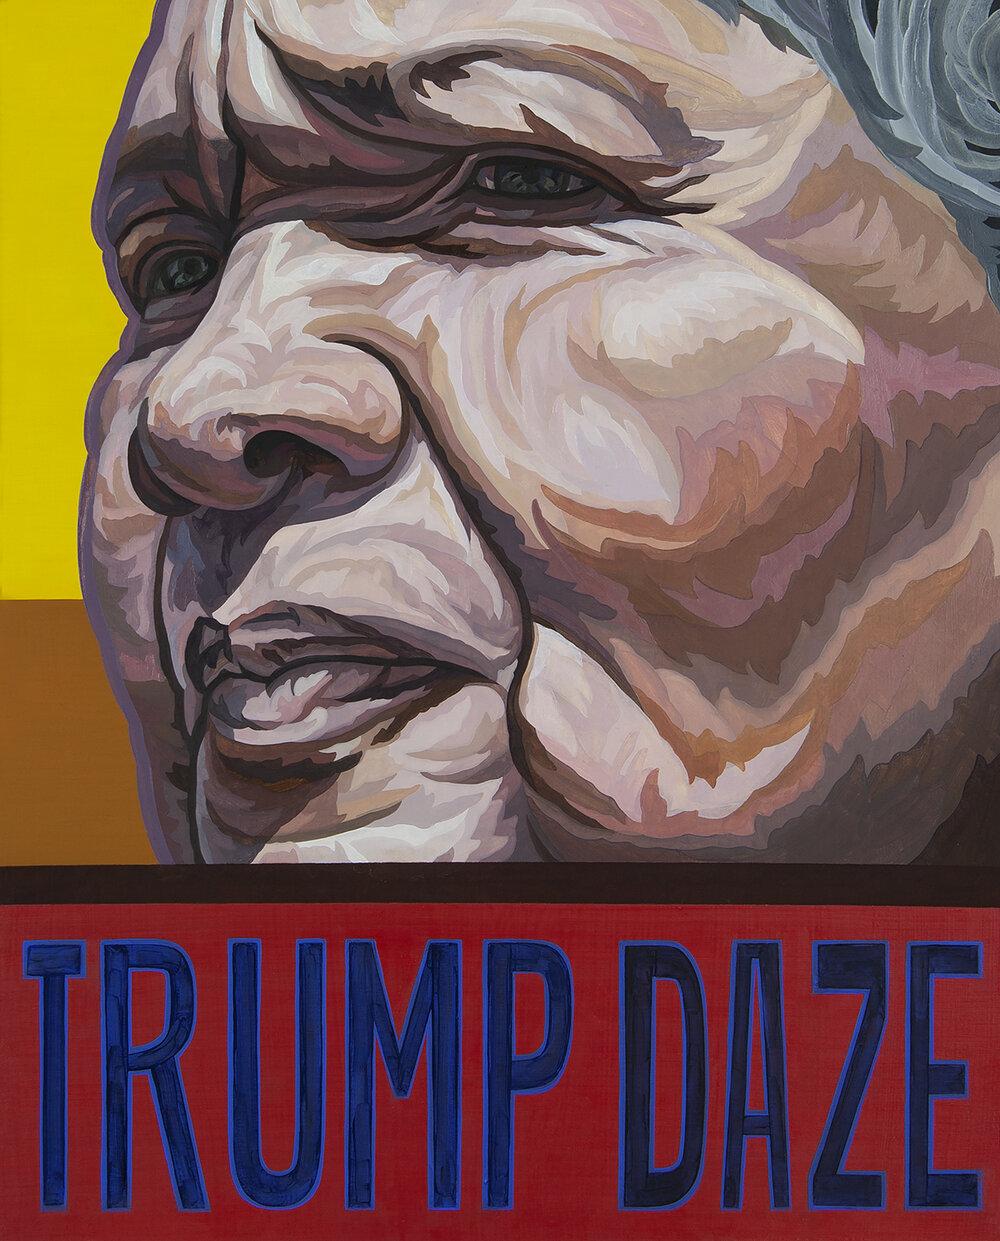 Trump Daze